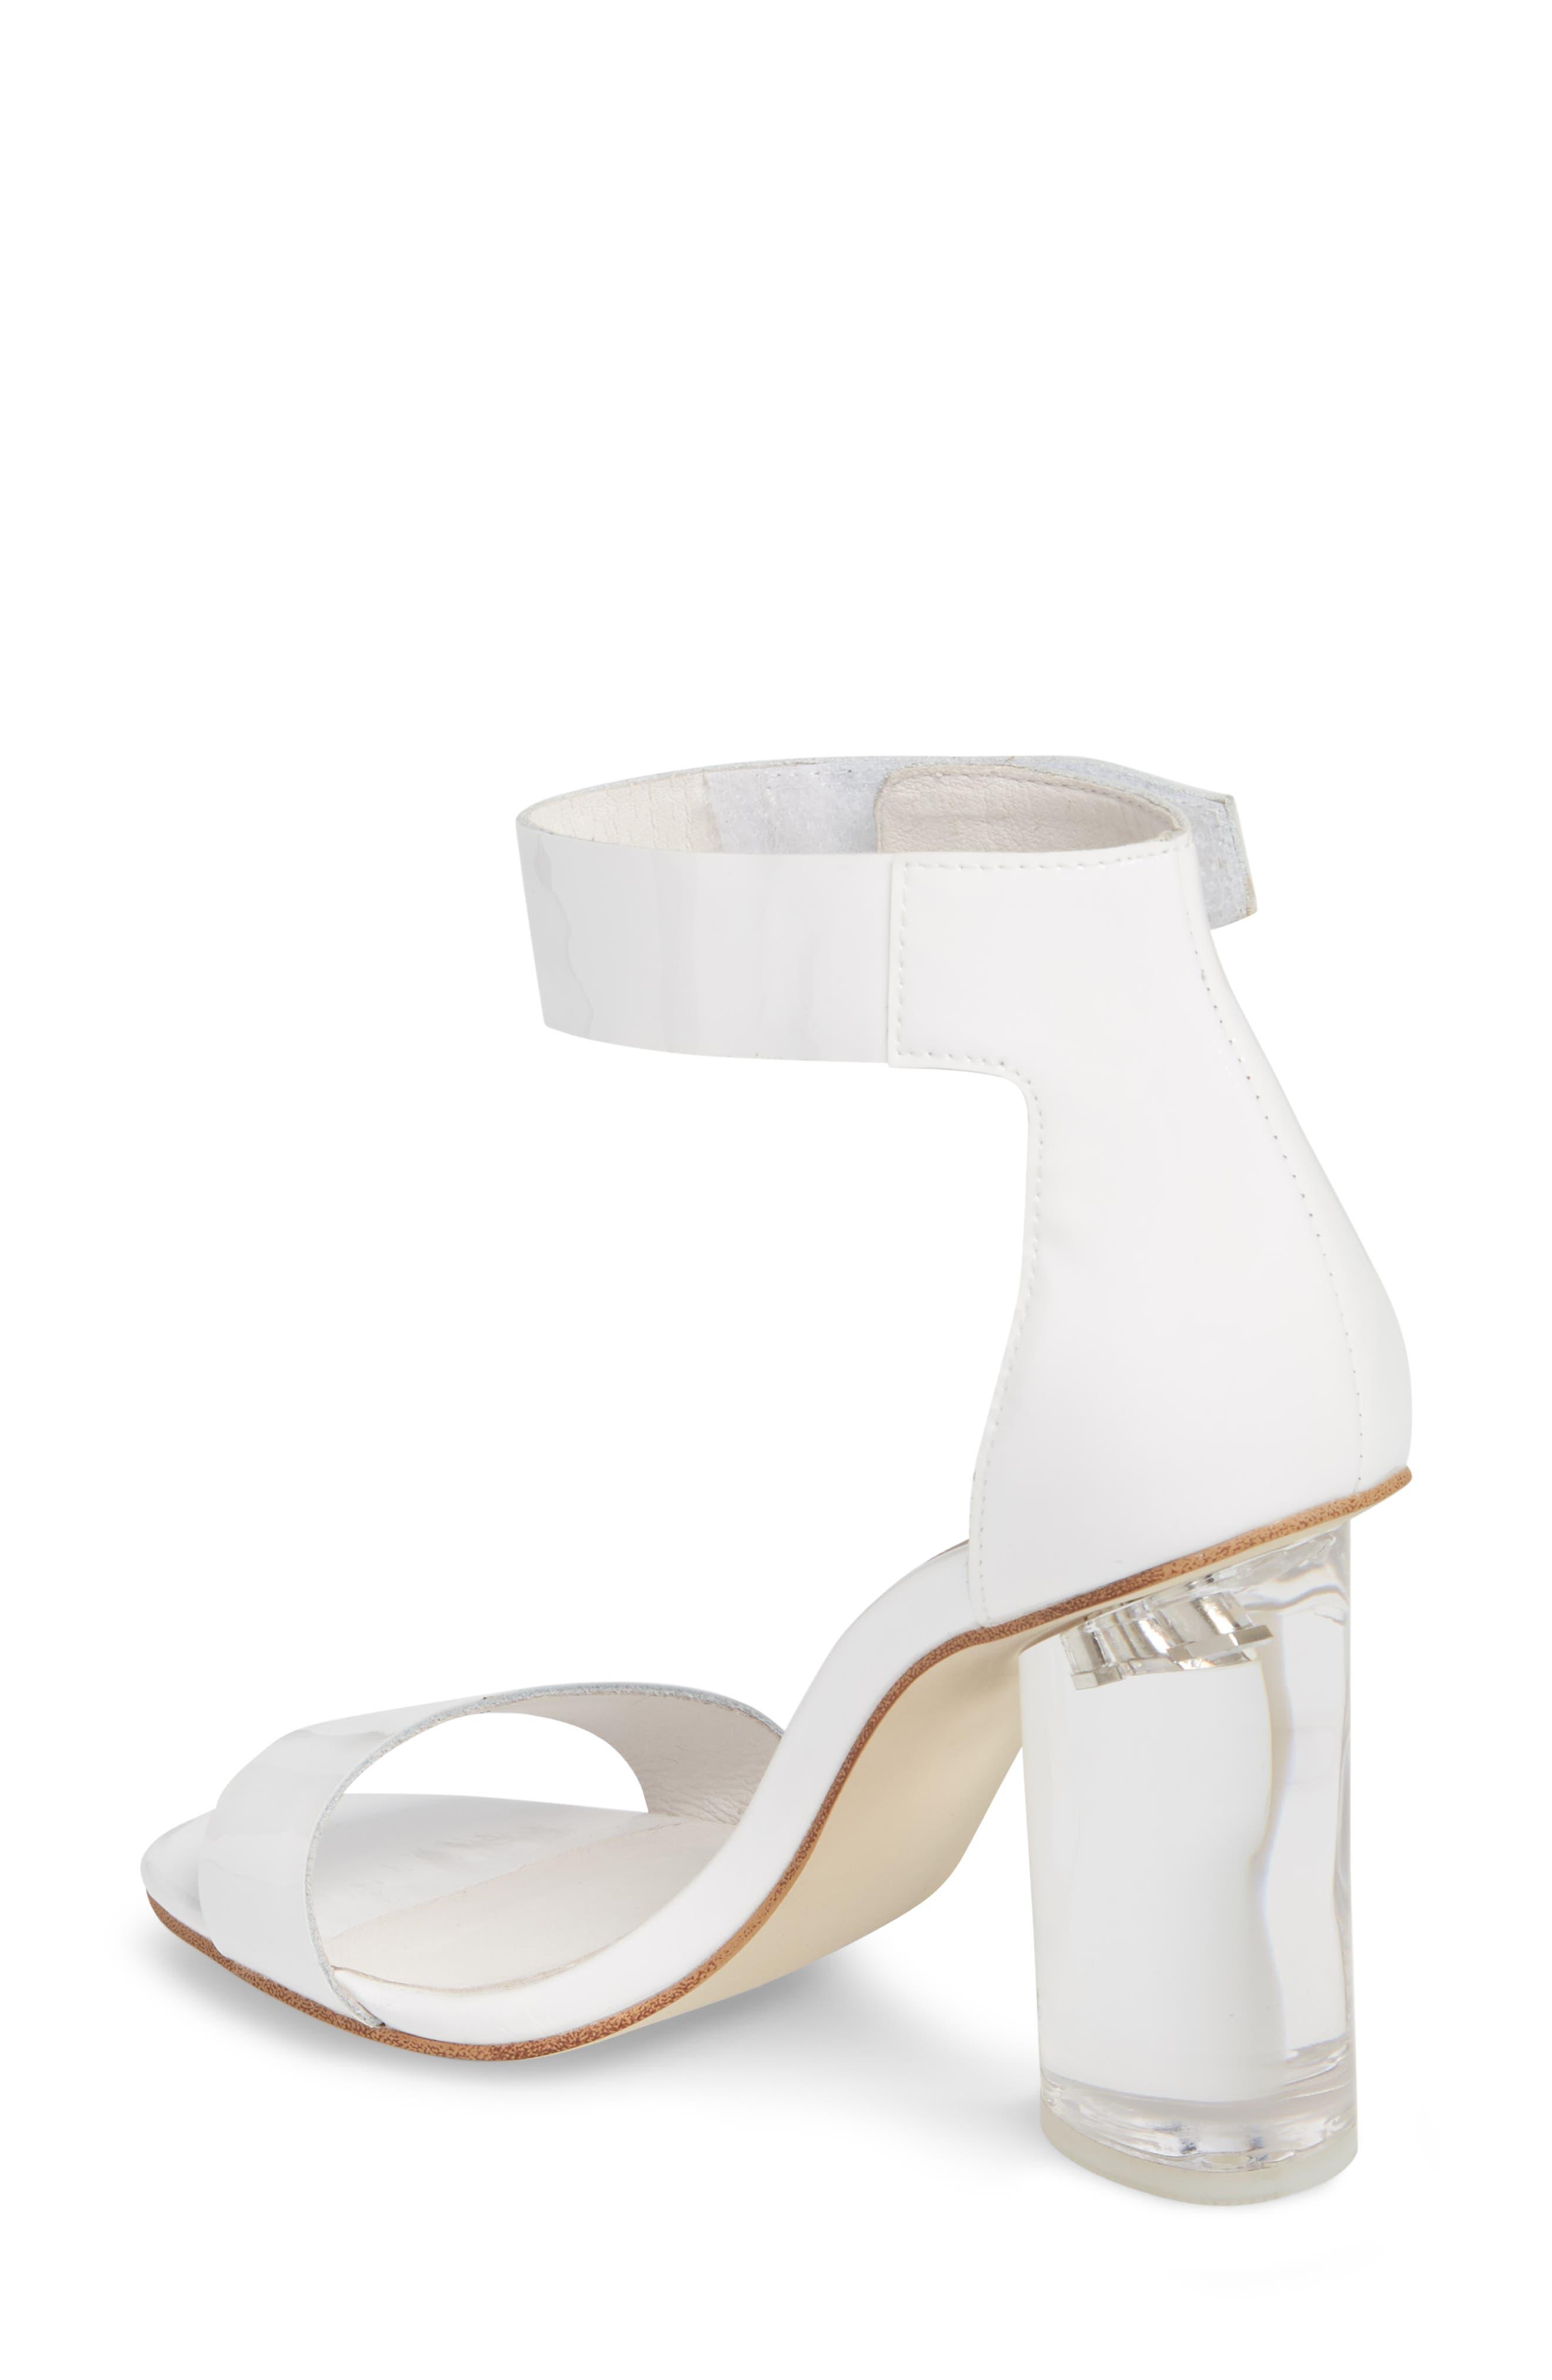 Alessa Clear Heel Sandal,                             Alternate thumbnail 2, color,                             White Patent